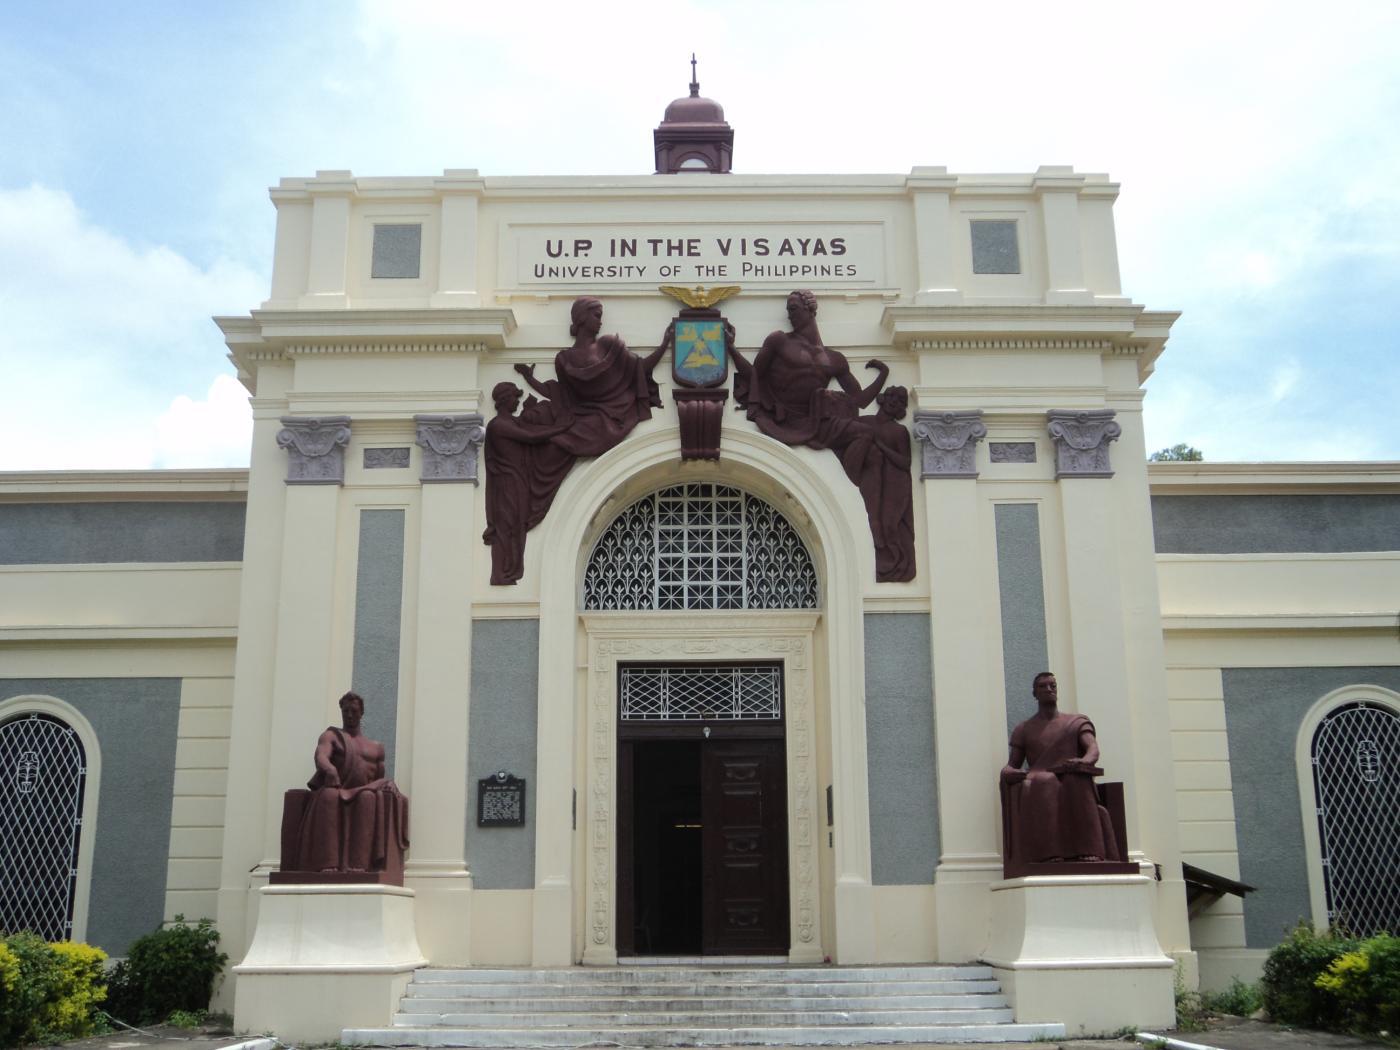 University of the Philippines, Visayas